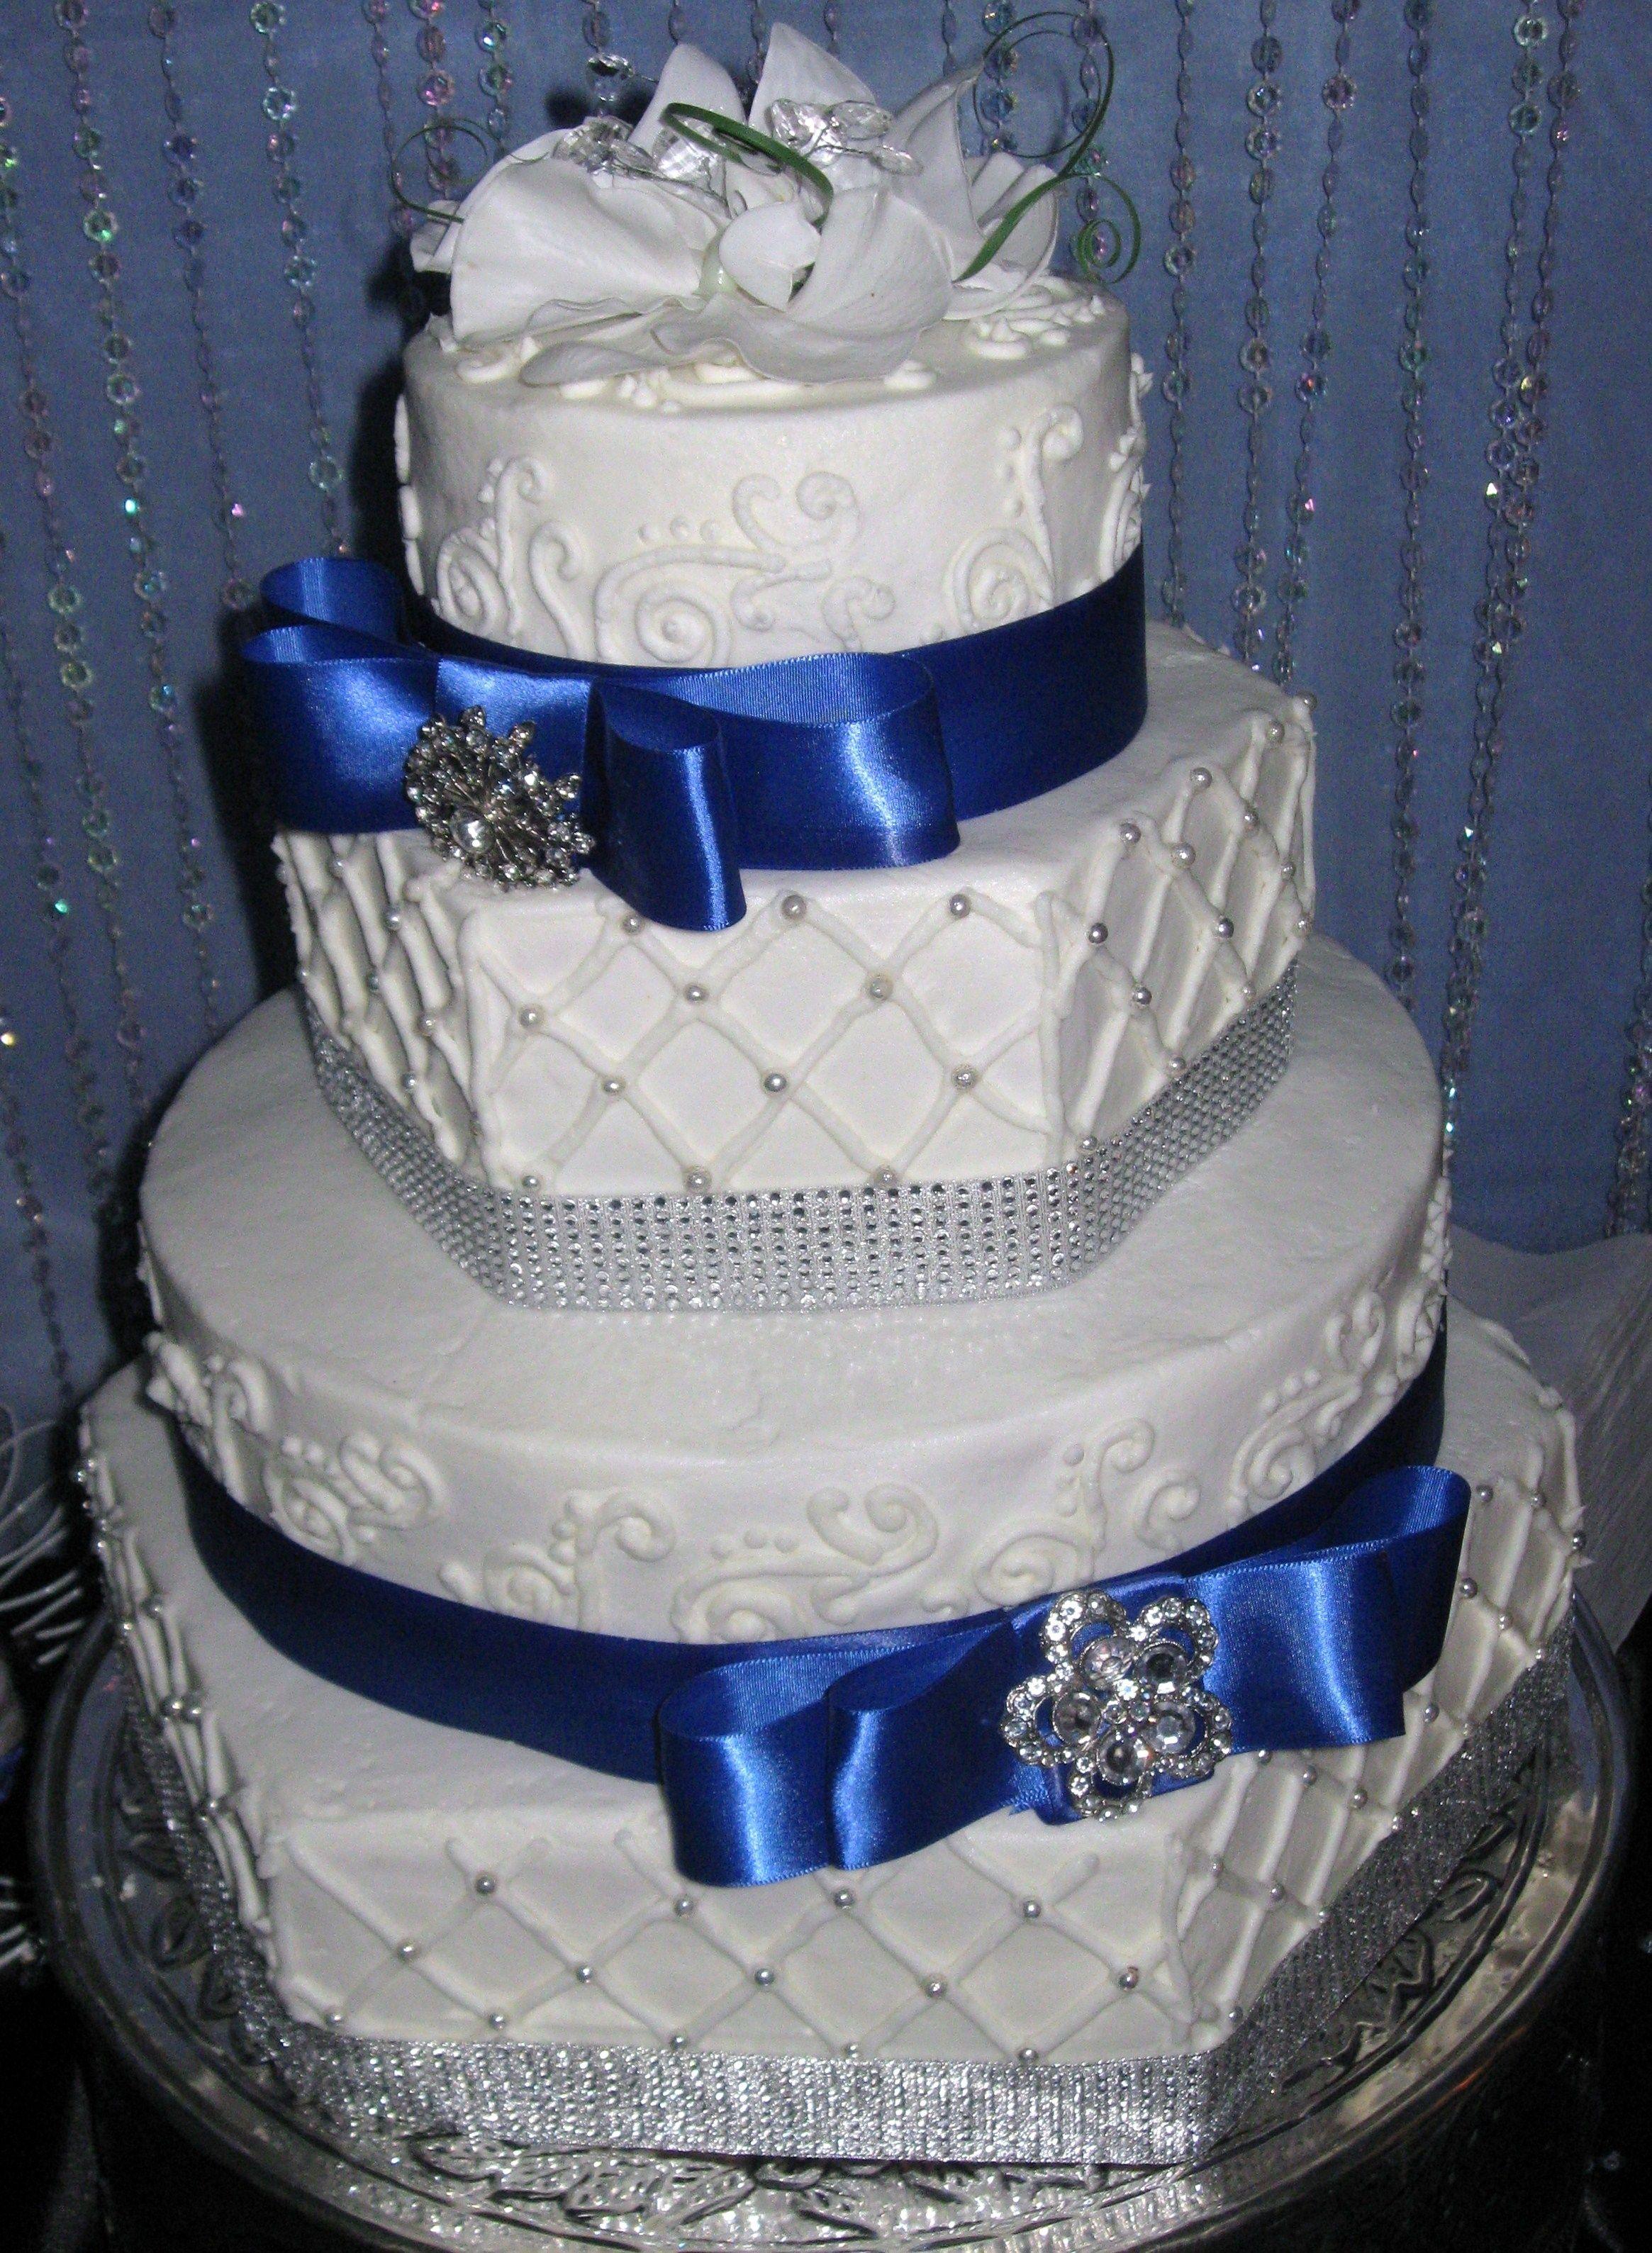 Hexagon royal blue wedding cake - Hexagon and round cakes with ...